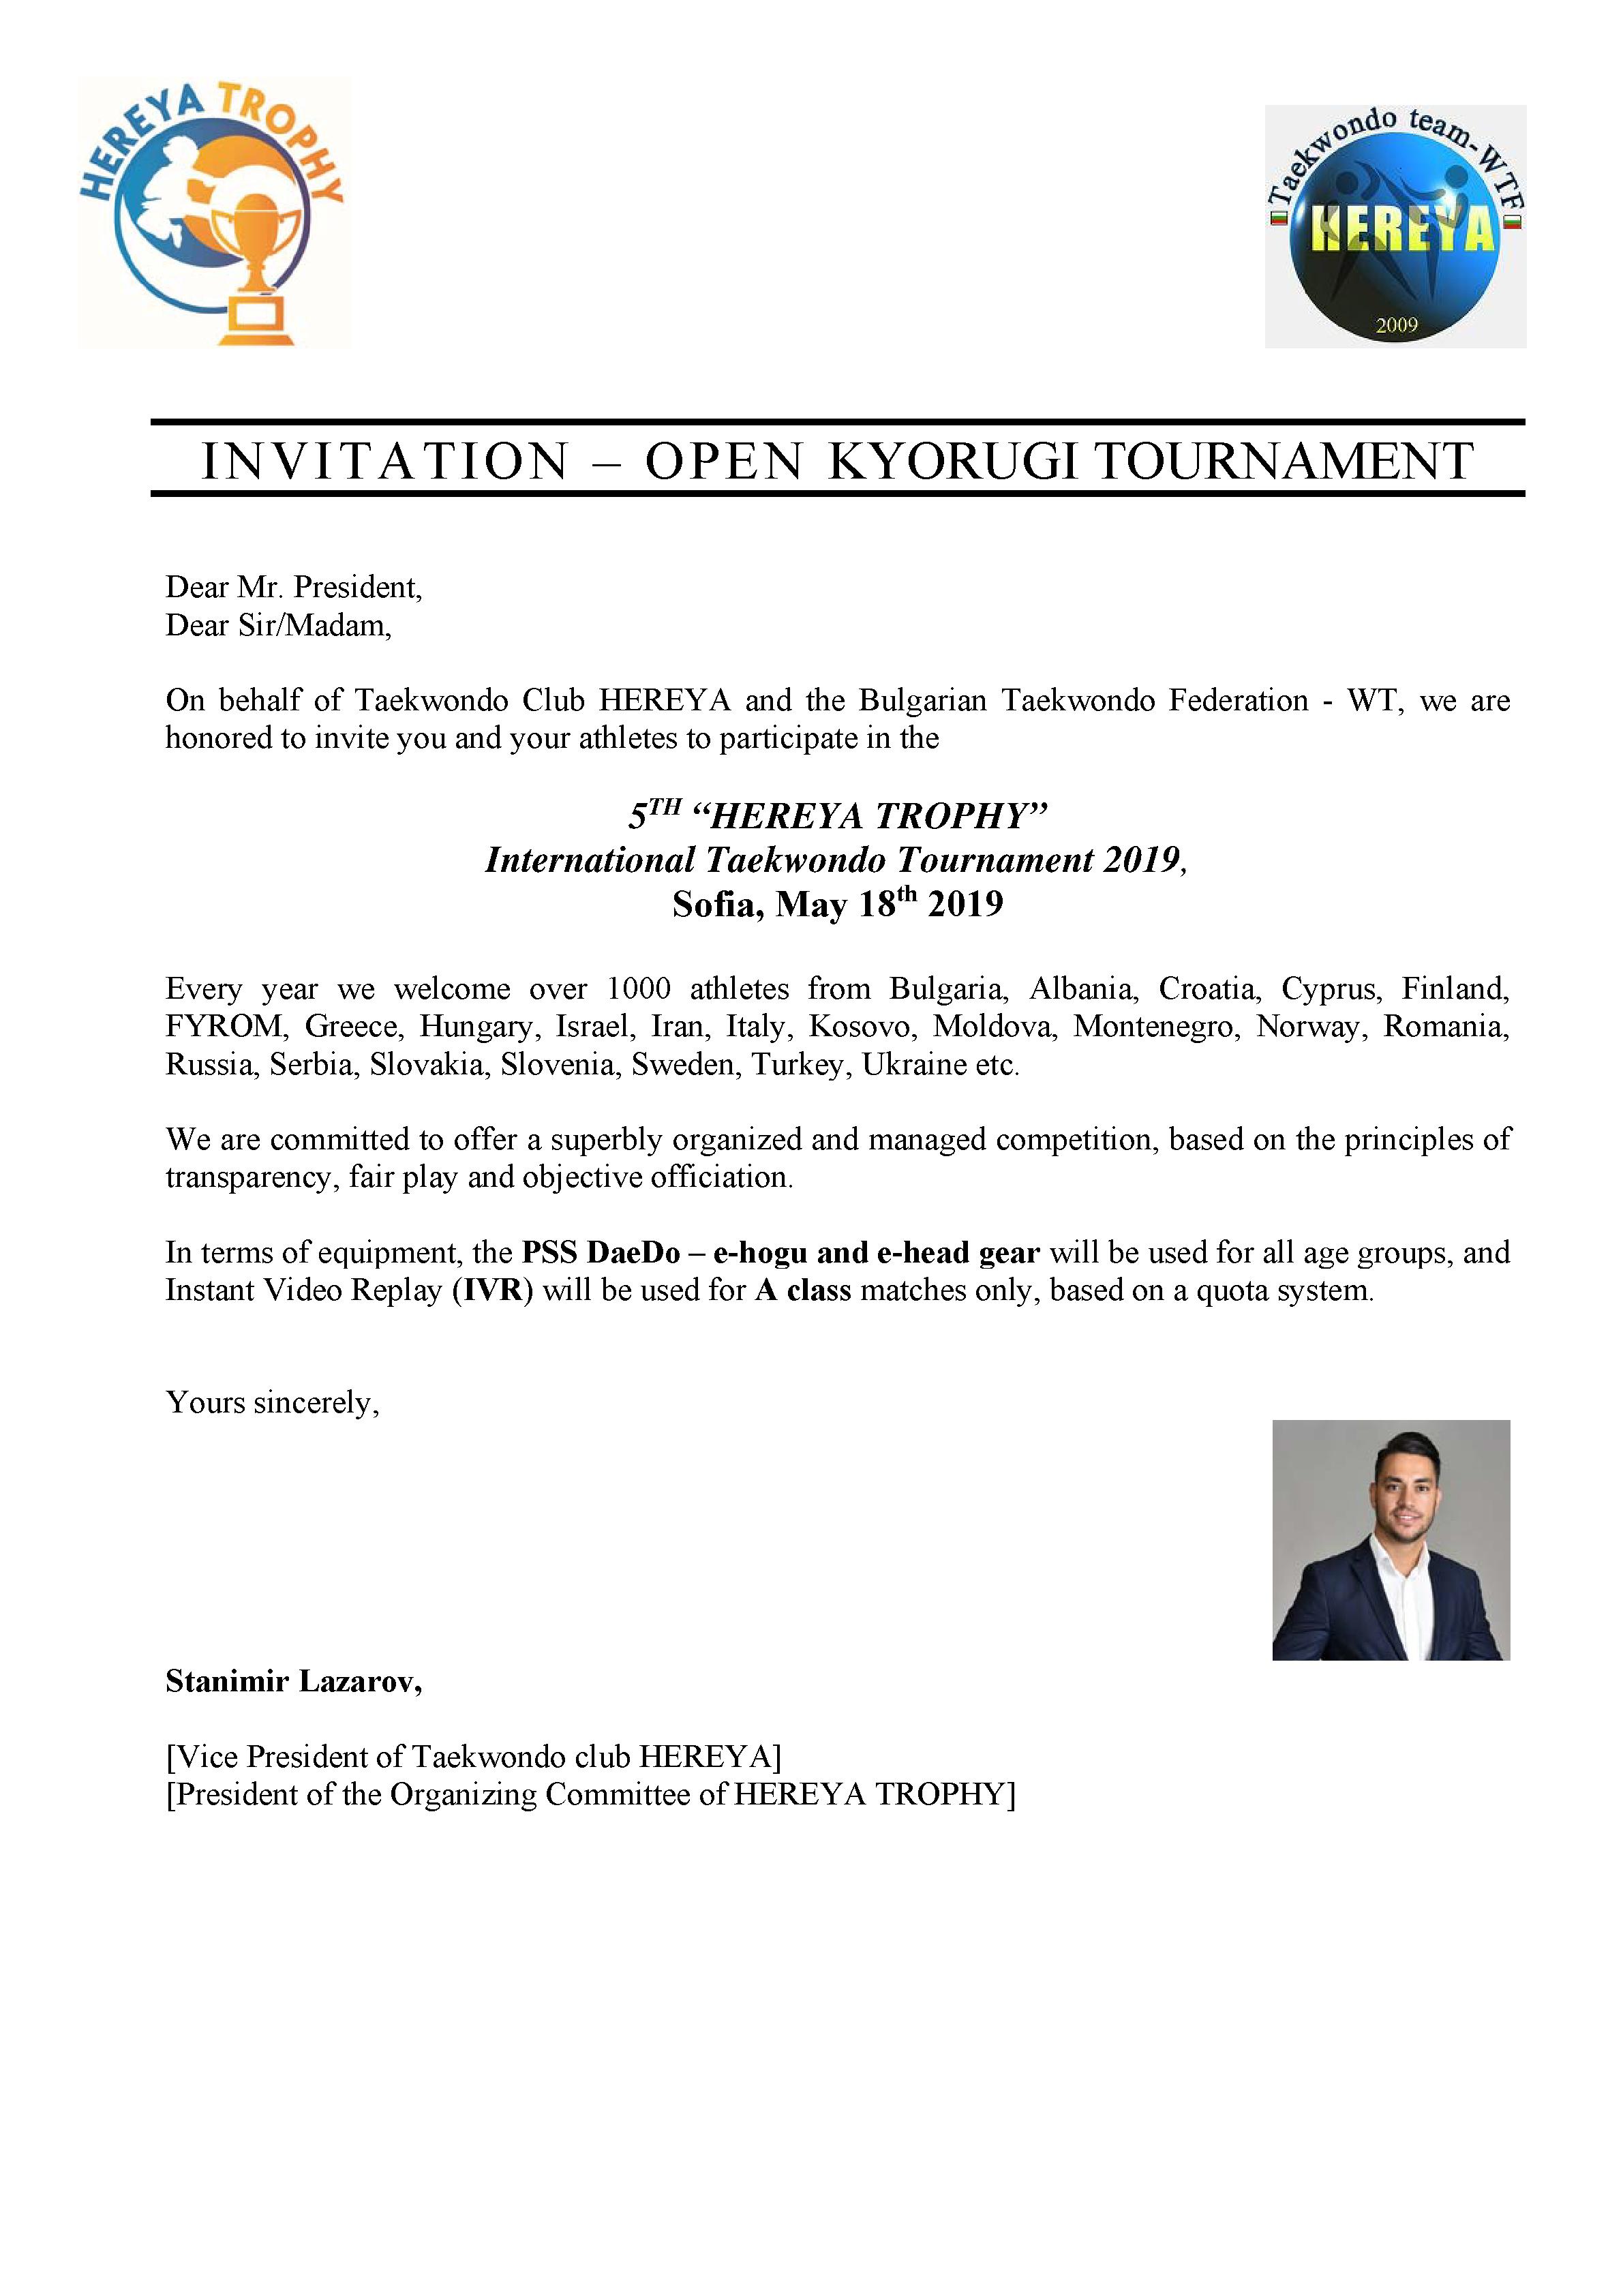 INVITATION – OPEN KYORUGI TOURNAMENT